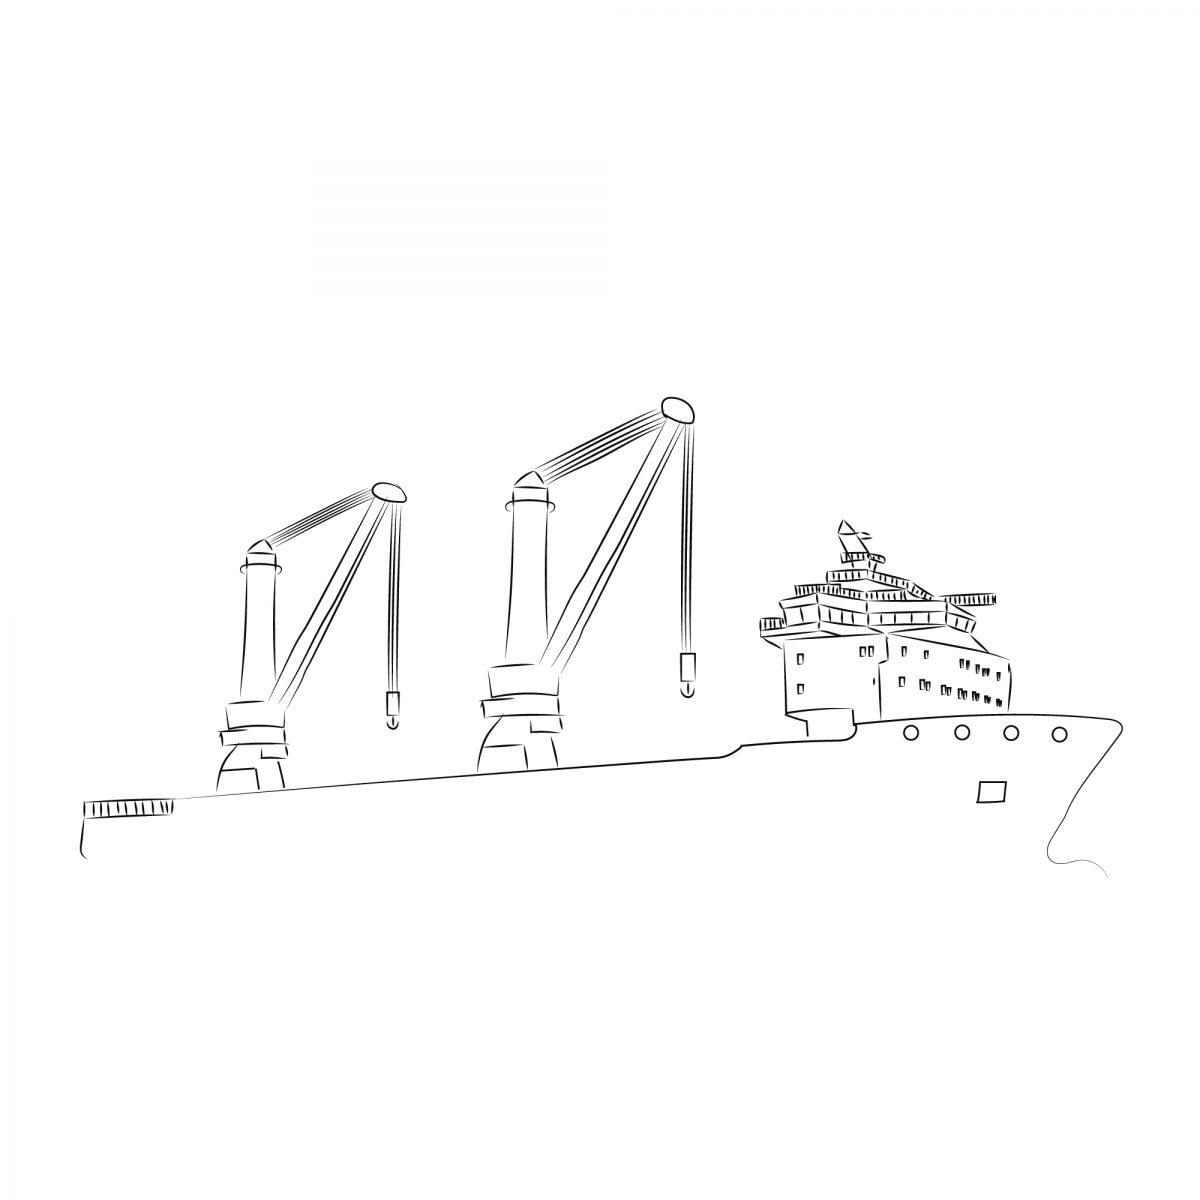 Studio-Tosca-Jumbo-Shipping-kinetic-schip-boot-tekening-illustratie